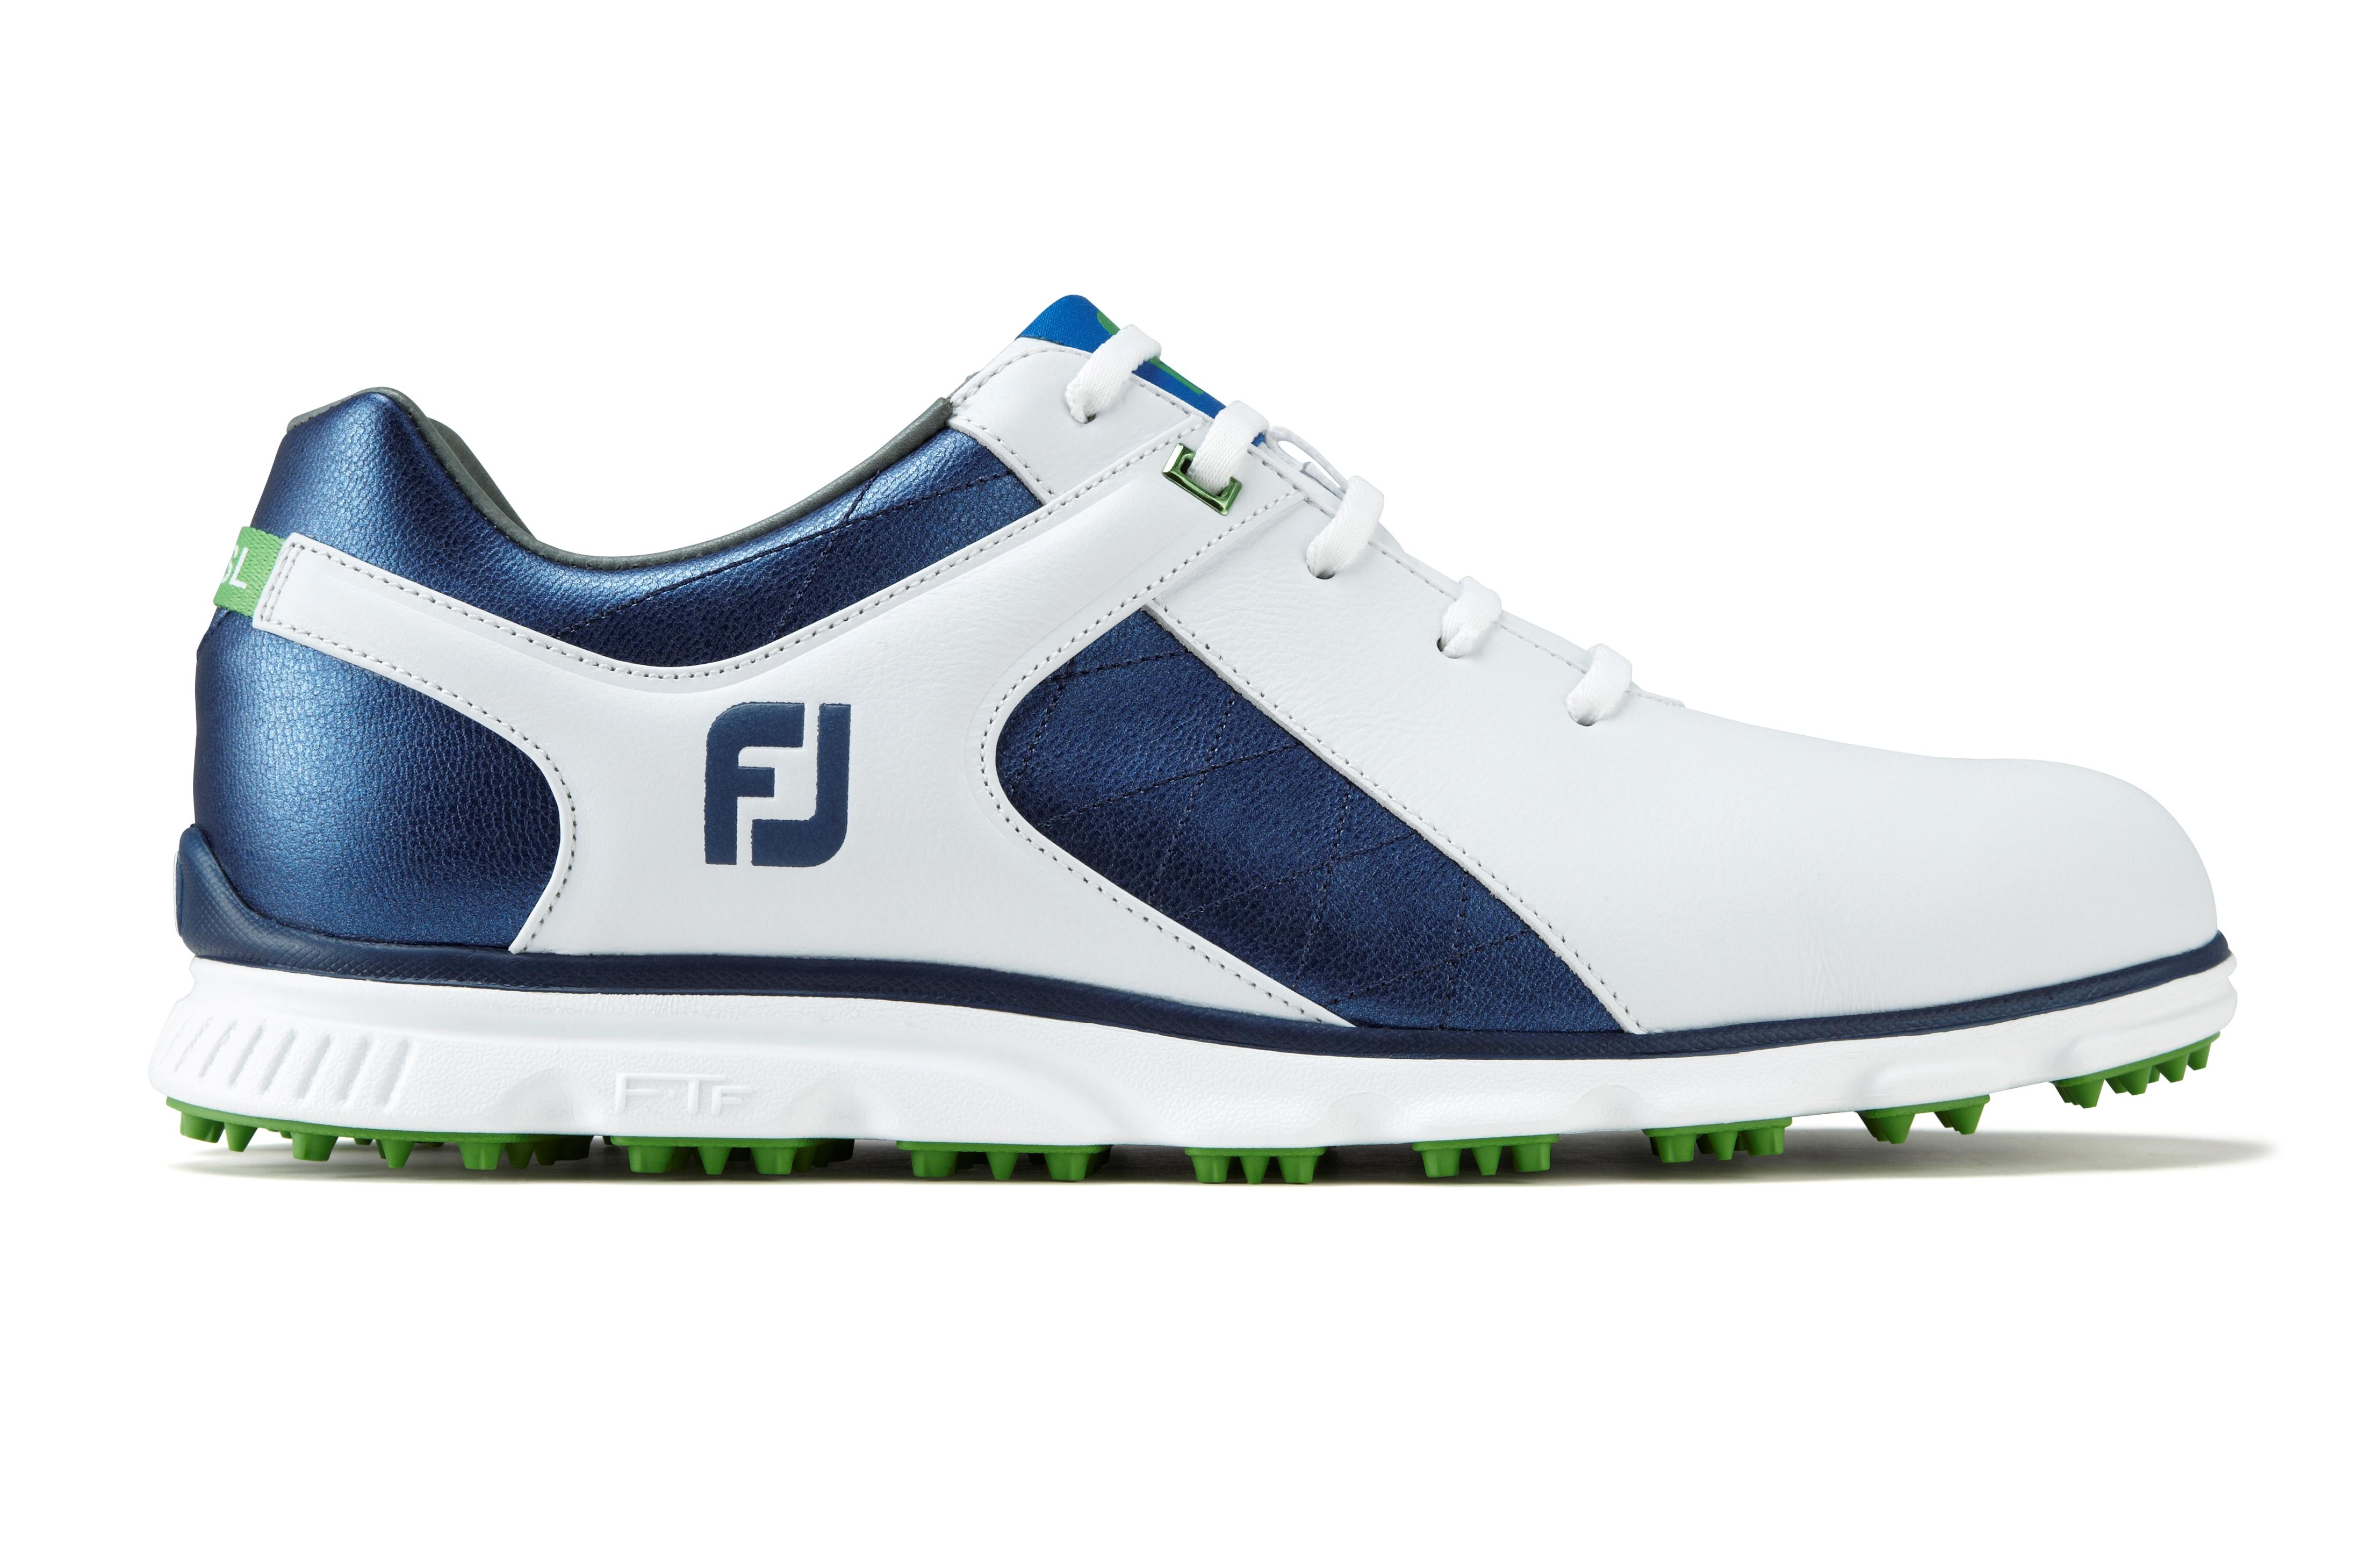 FootJoy FootJoy Pro SL spikeless golf shoe review  f8d00443f